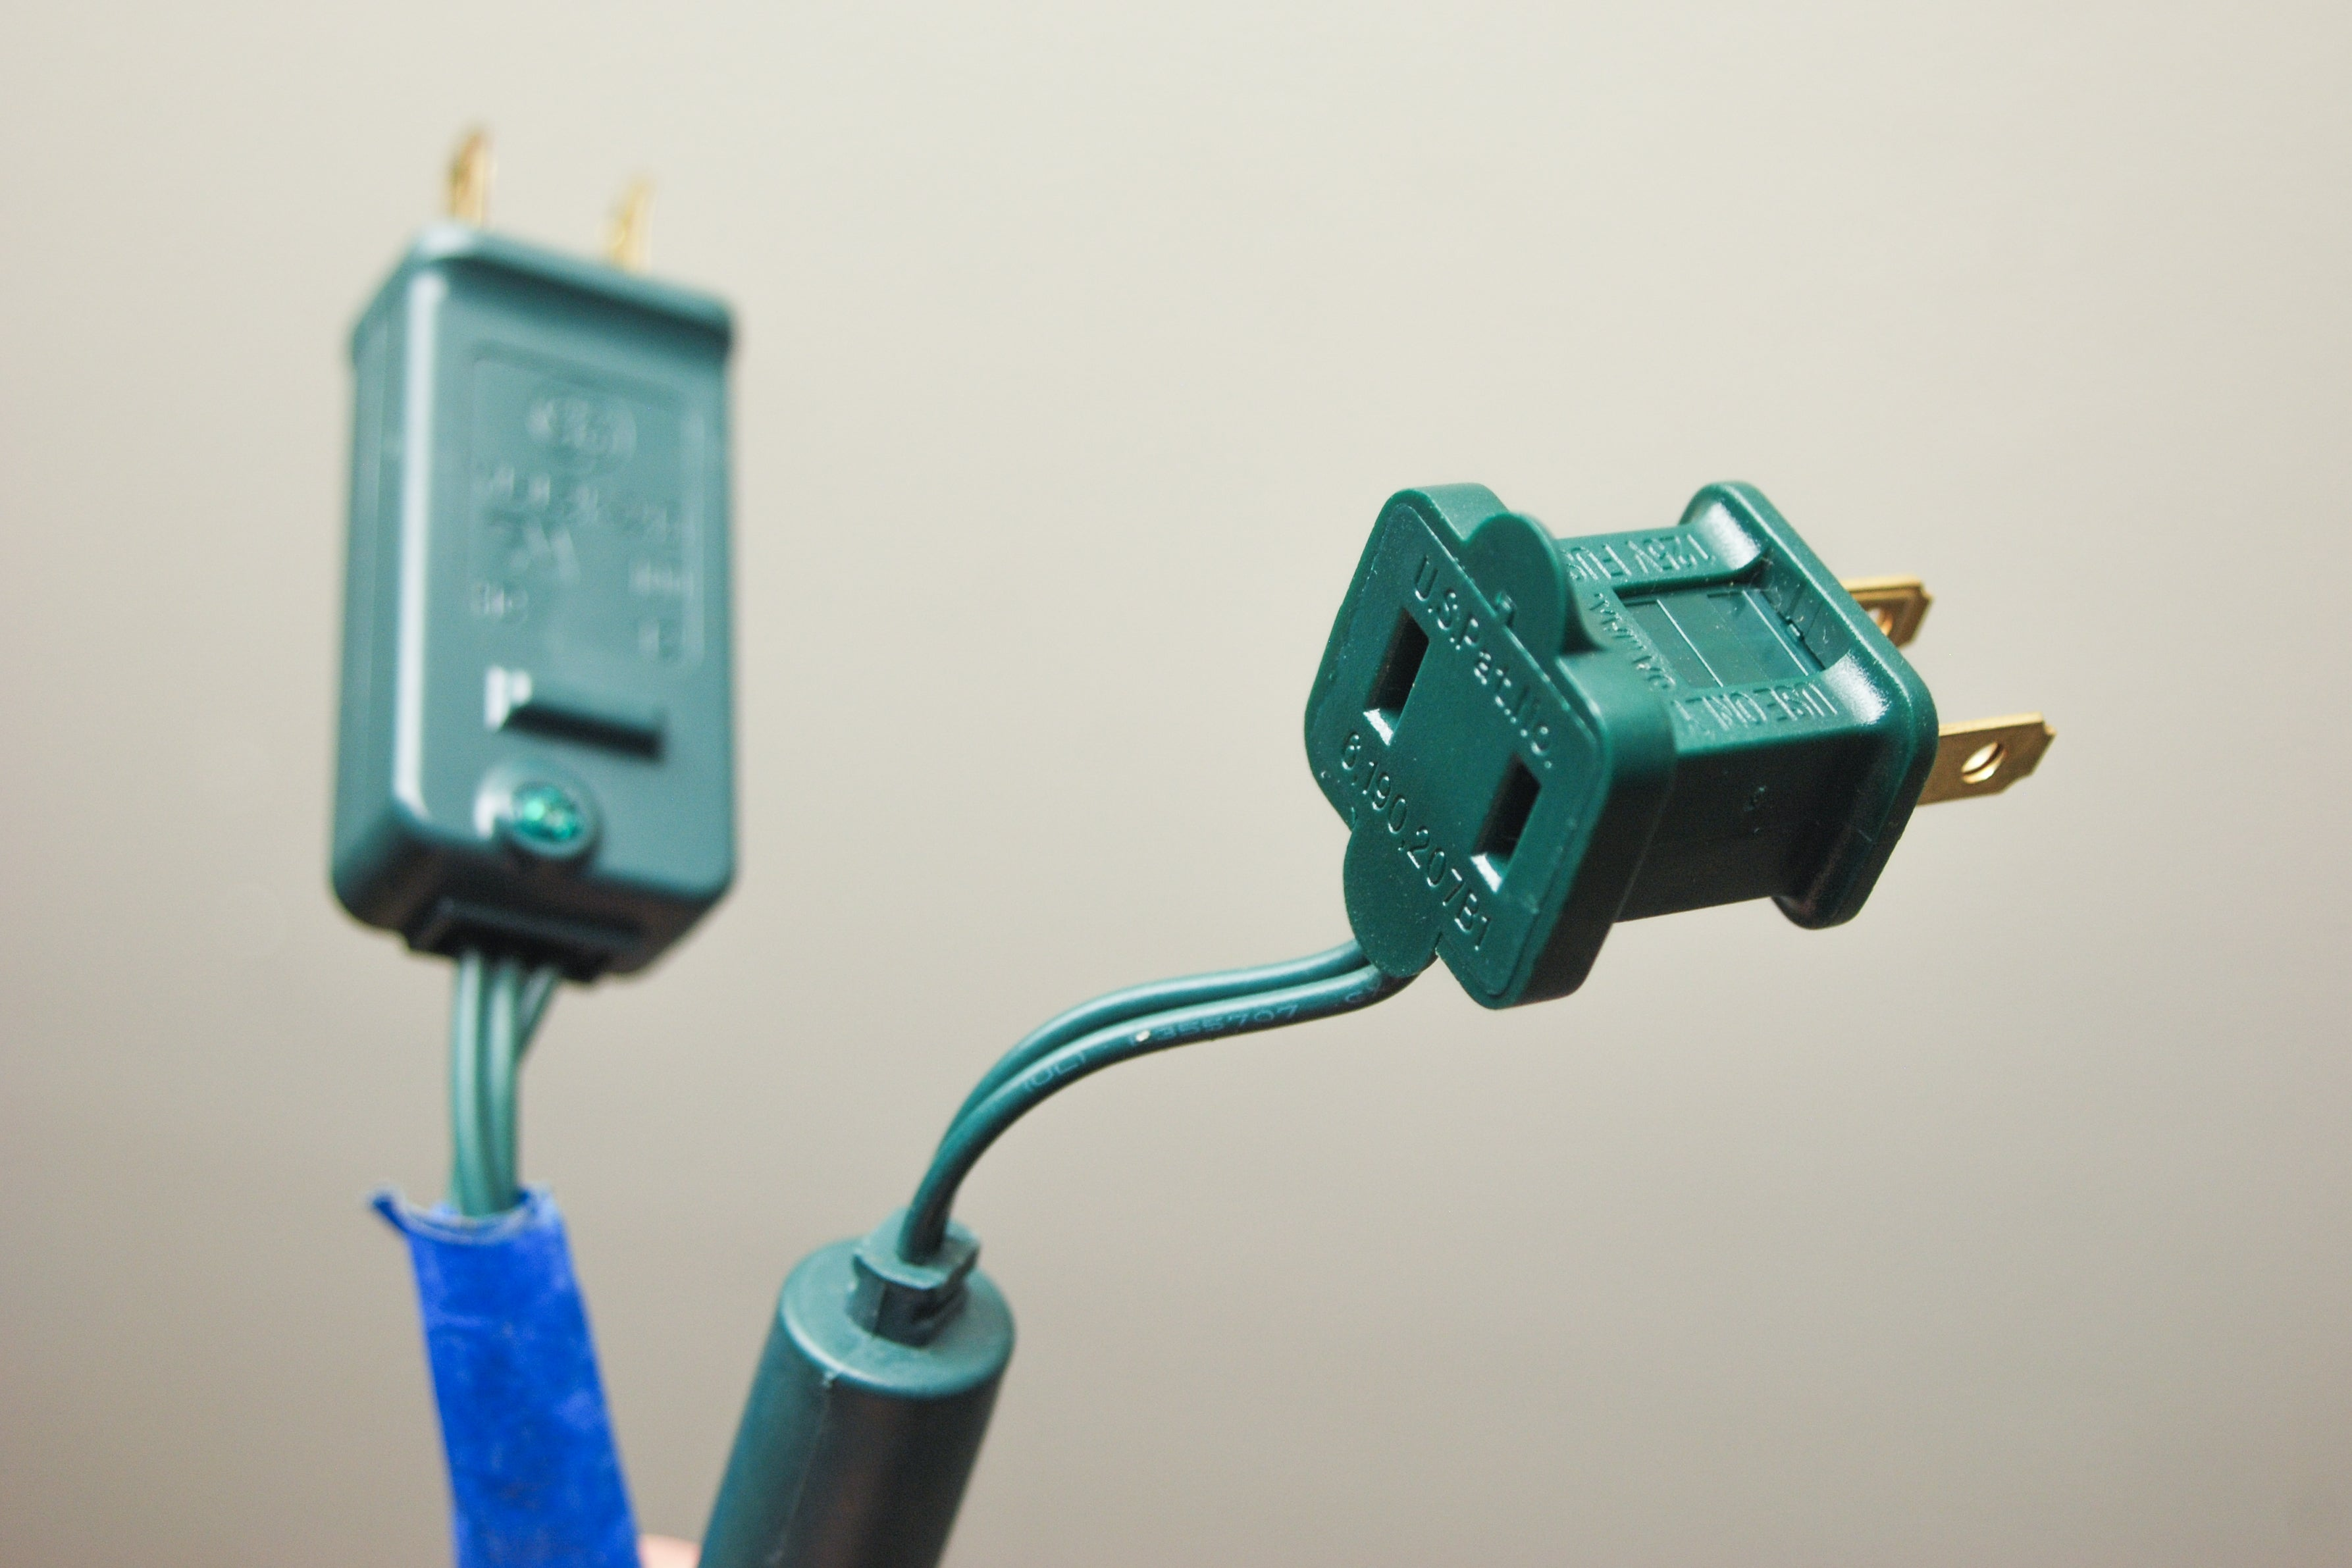 Christmas light plugs